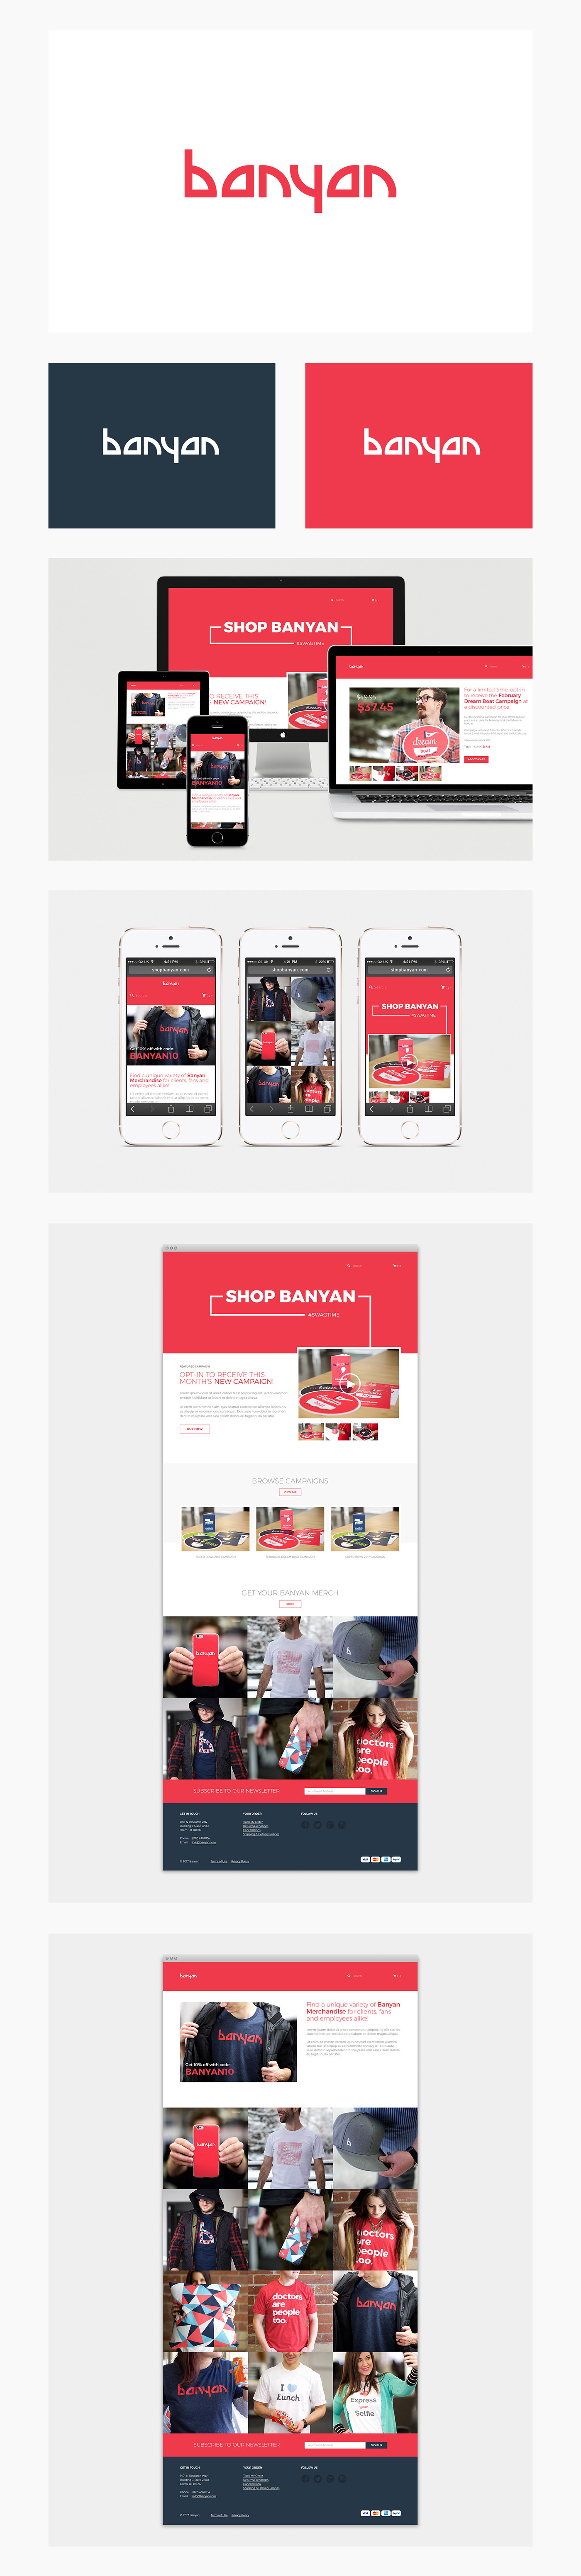 branding  Ecommerce Photography  Web Design  graphic design